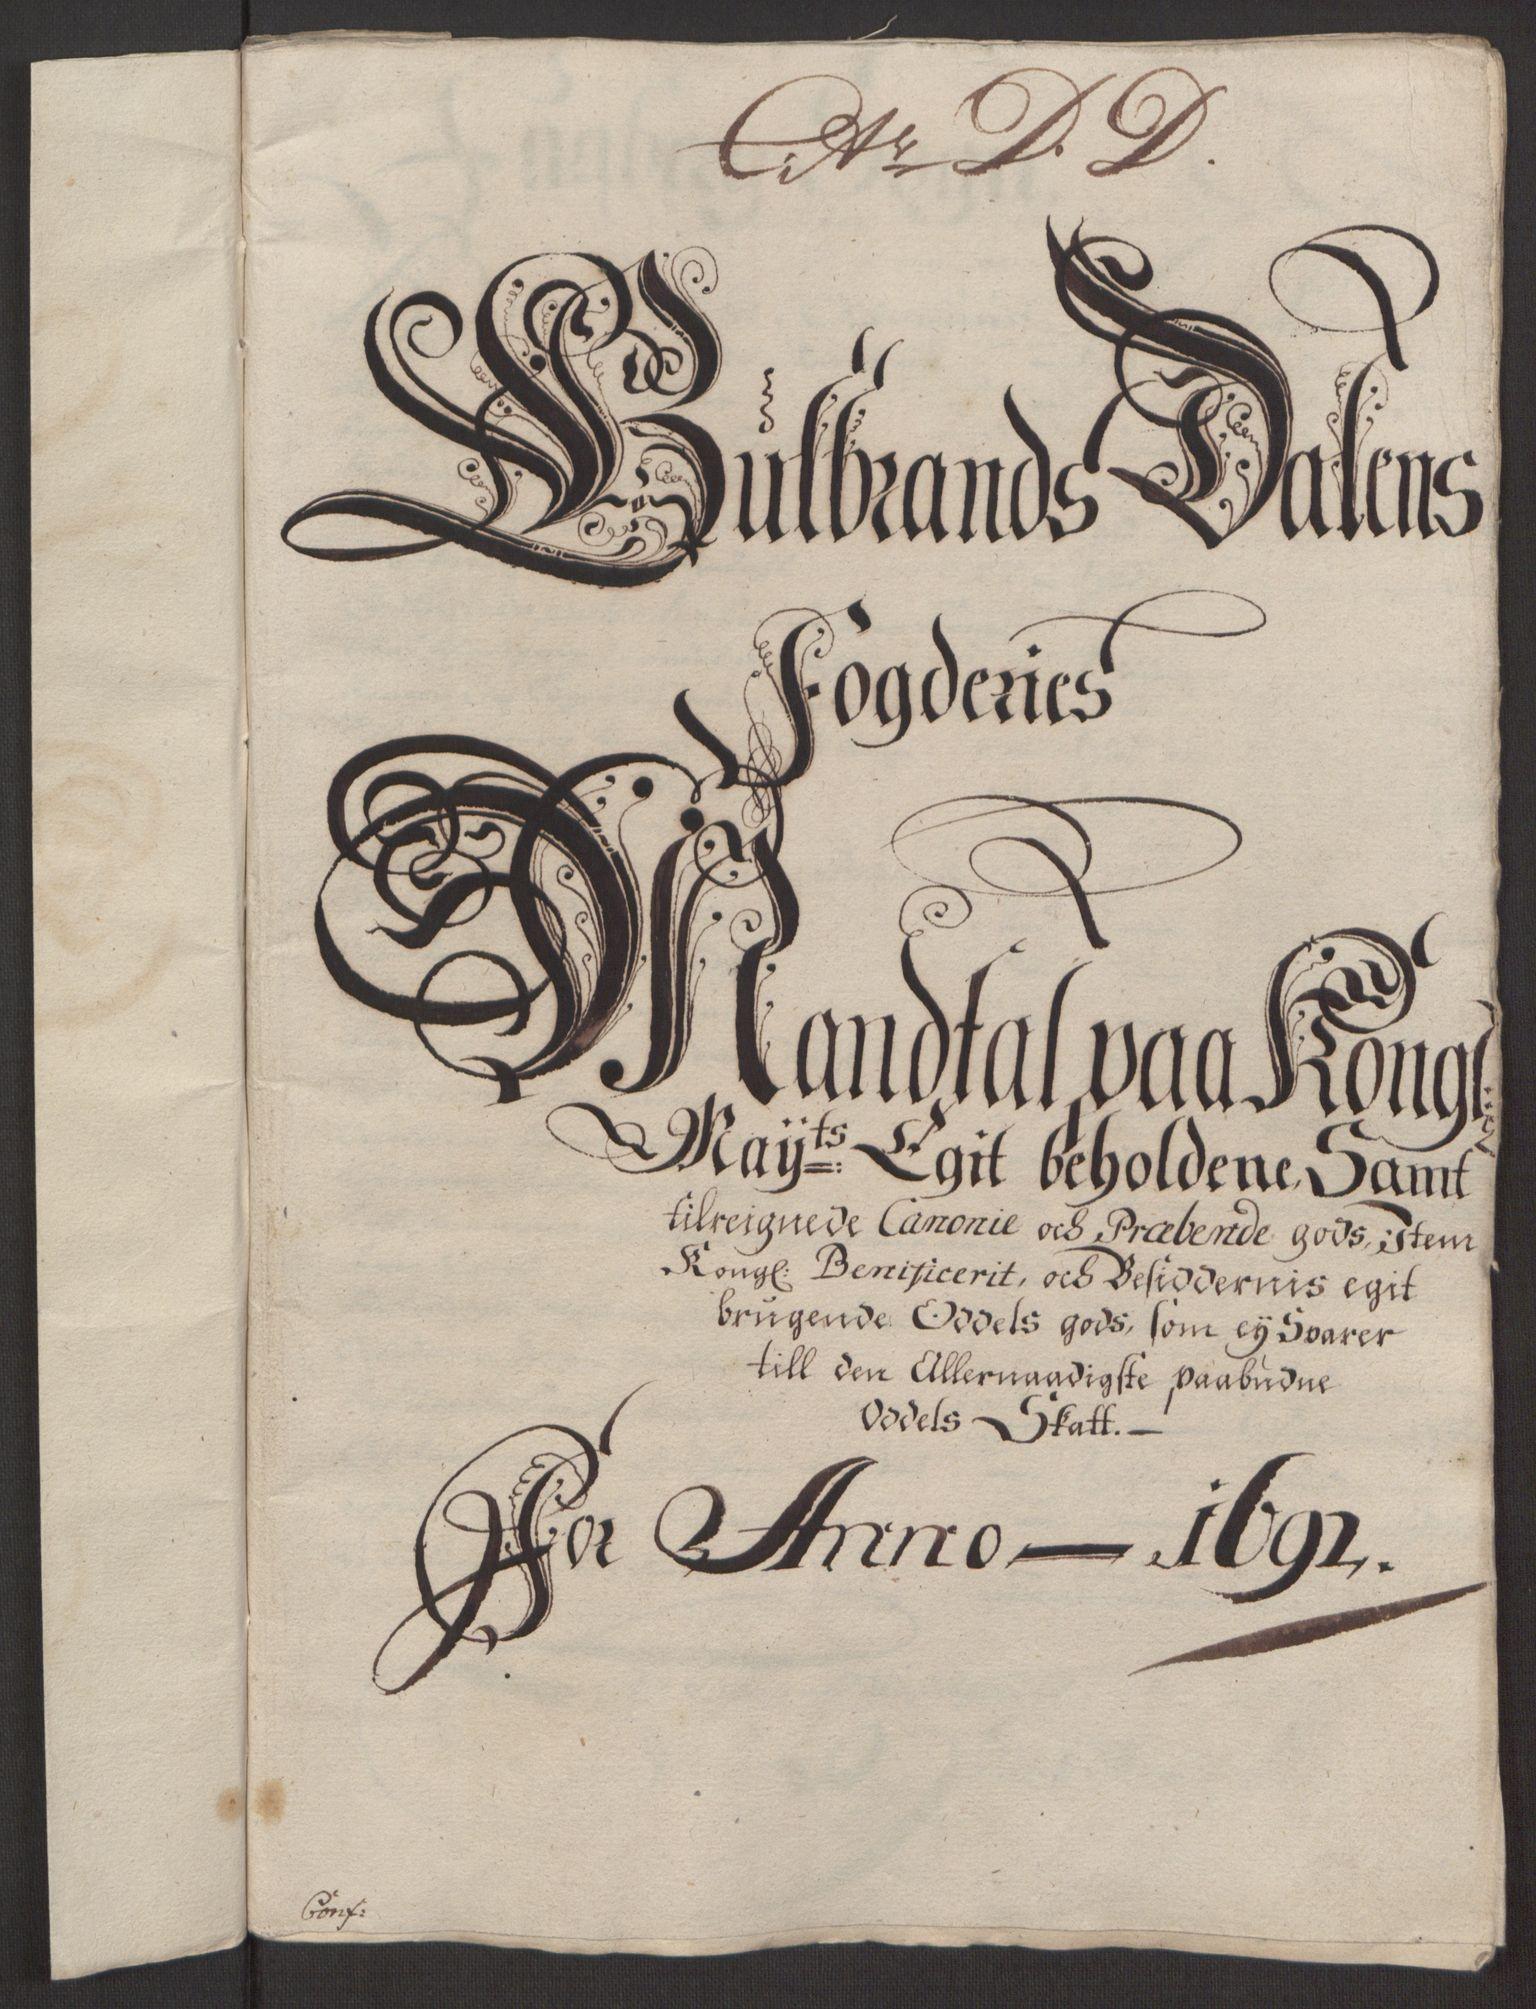 RA, Rentekammeret inntil 1814, Reviderte regnskaper, Fogderegnskap, R17/L1166: Fogderegnskap Gudbrandsdal, 1690-1692, s. 71